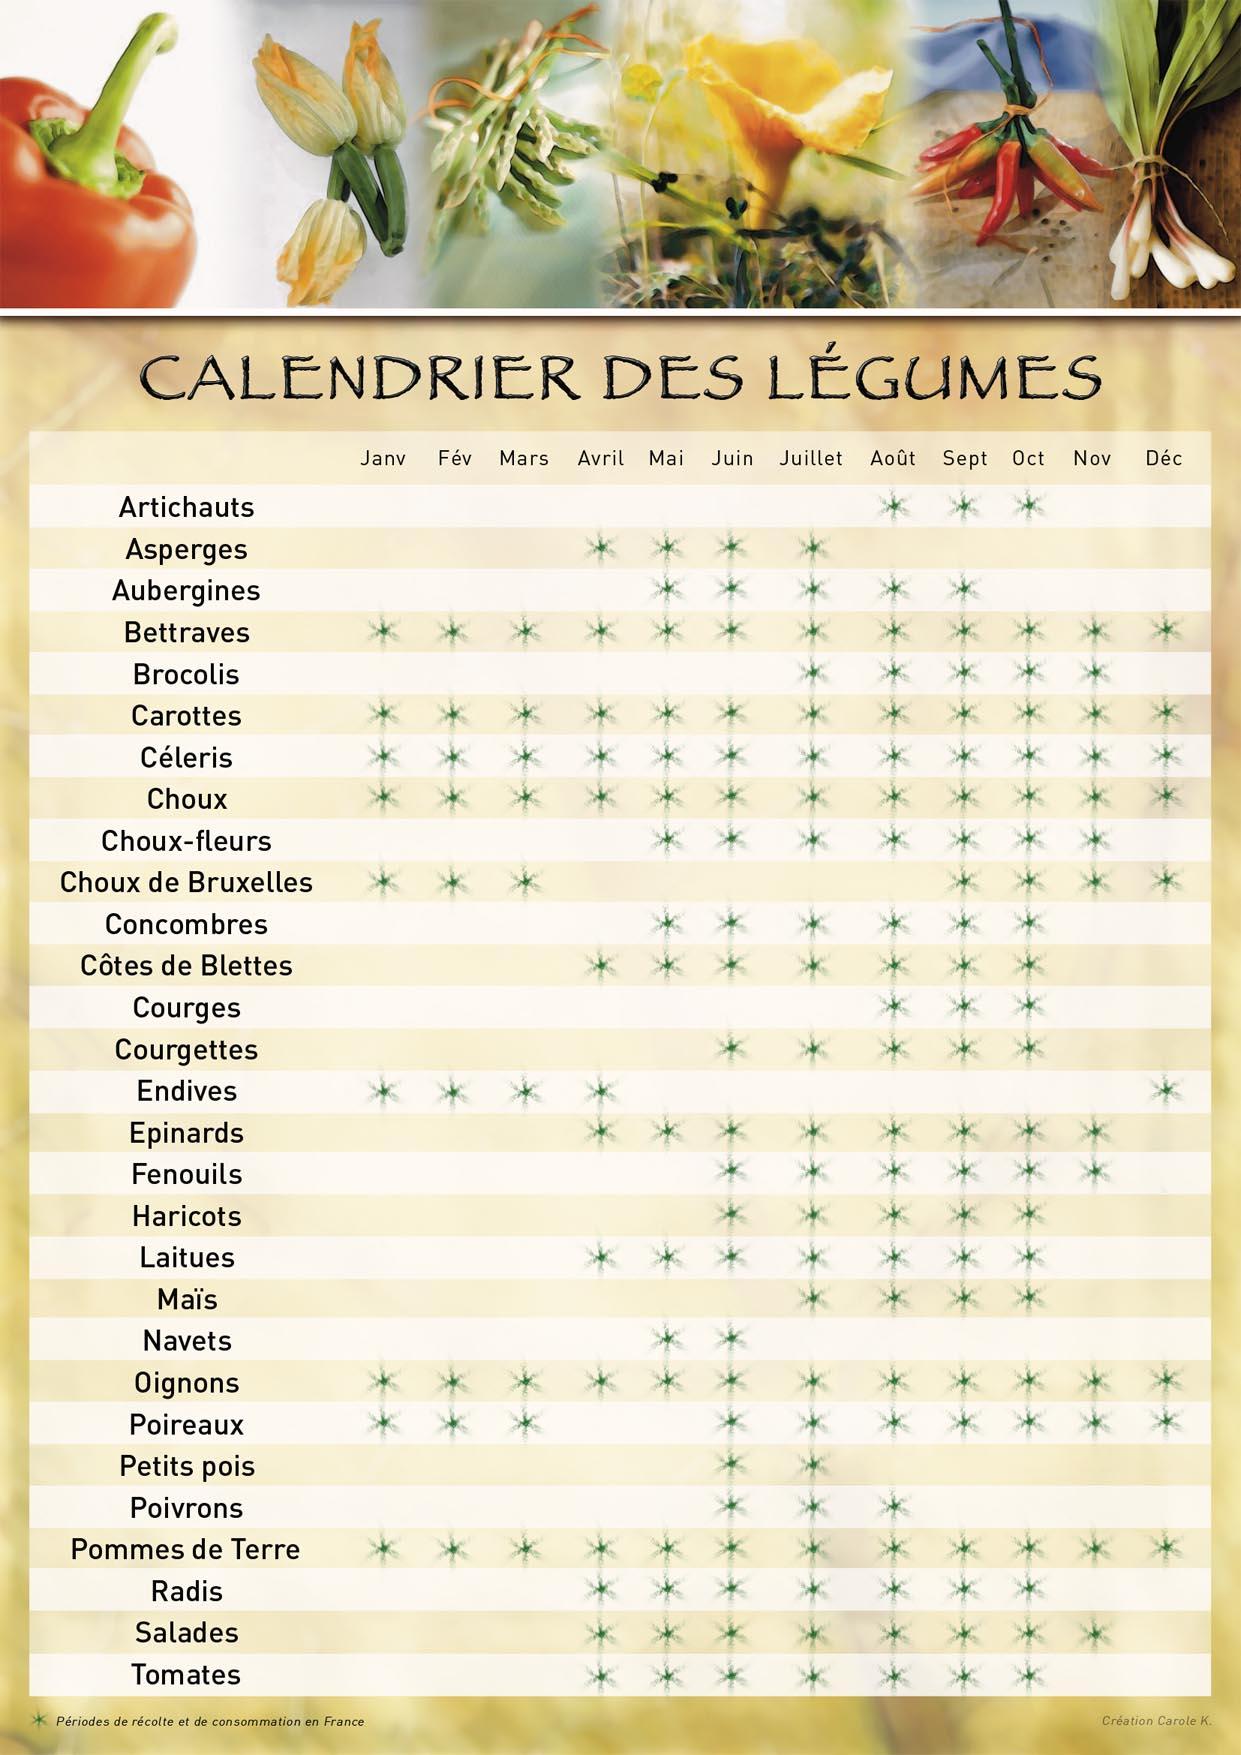 Calendrier Des Legumes.Calendrier Des Legumes